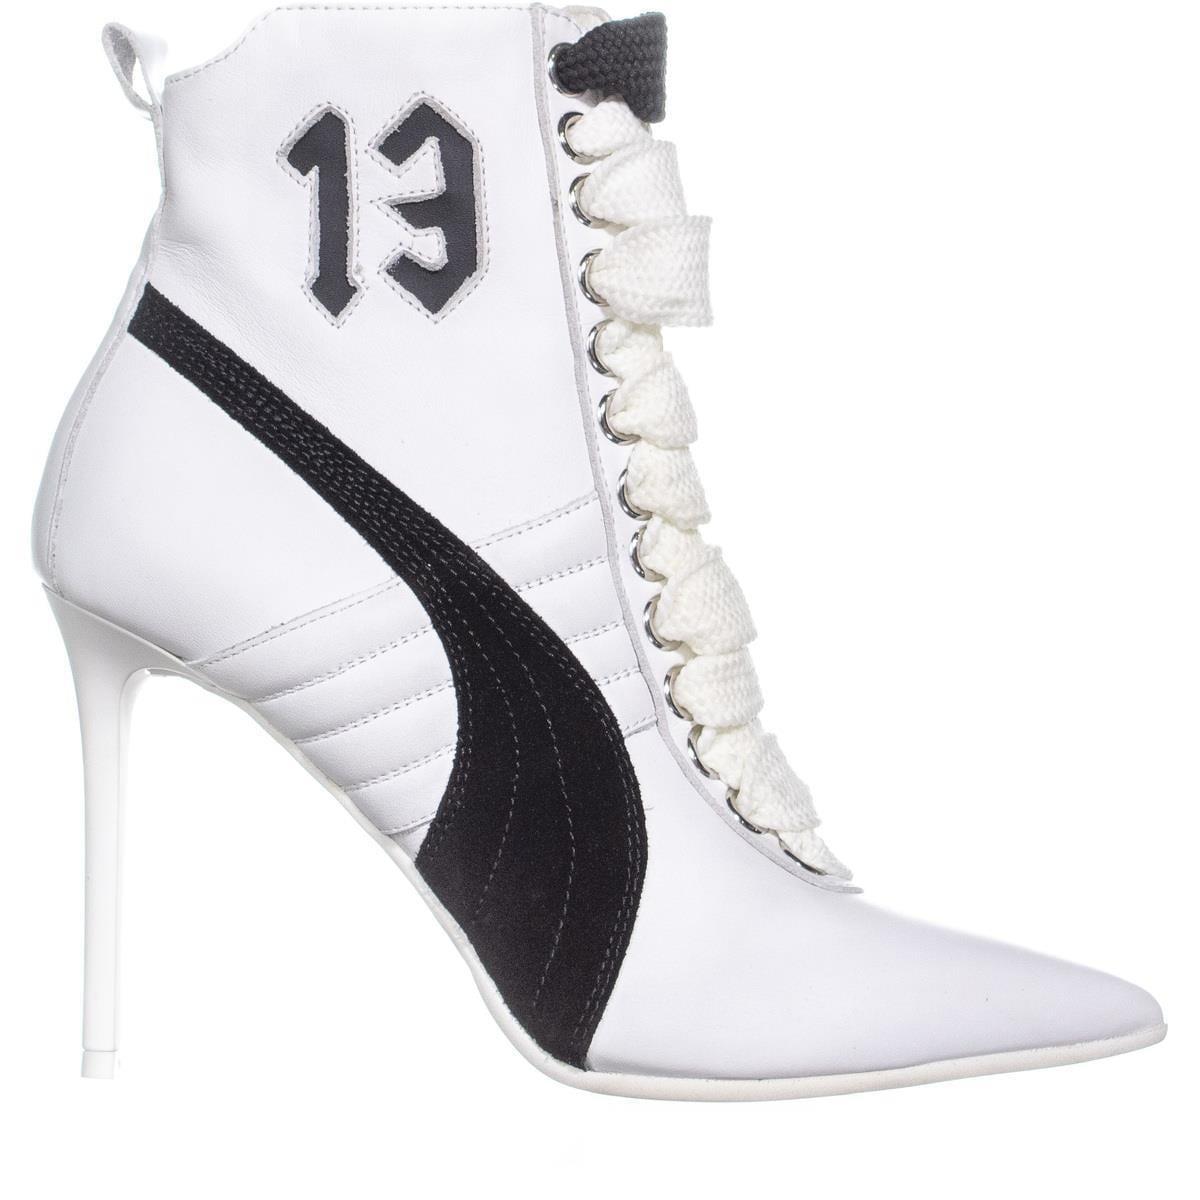 Shop PUMA Fenty High Heel Sneaker Ankle Boots cd1f0e061